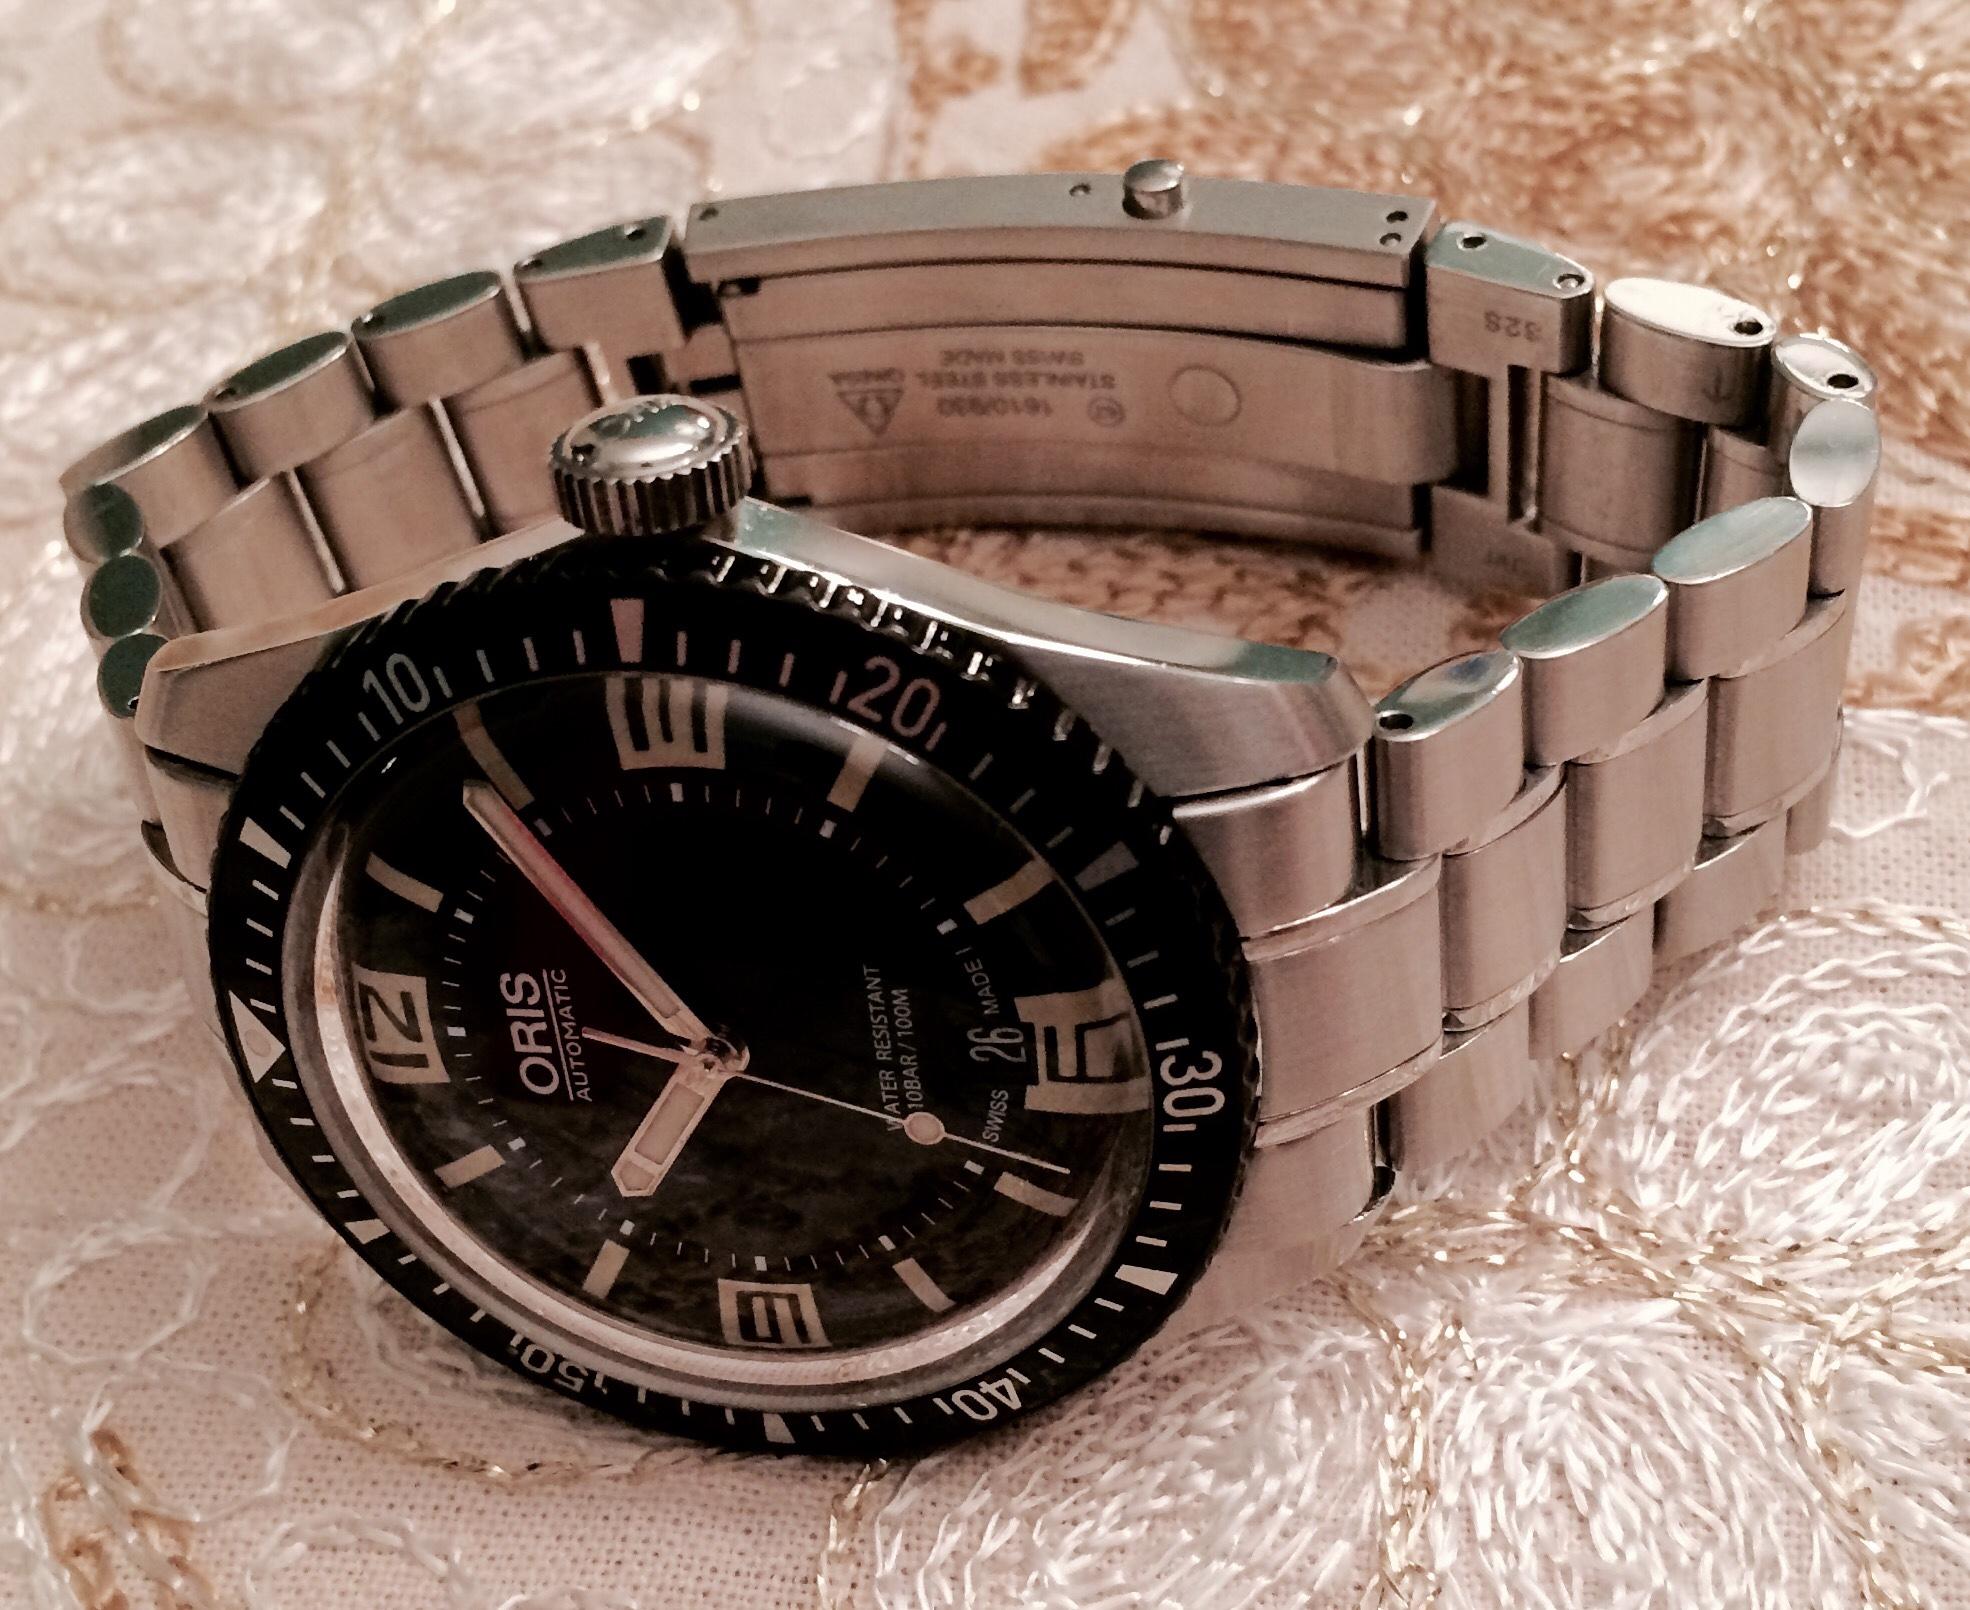 oris 65 ss bracelet alternative replacement